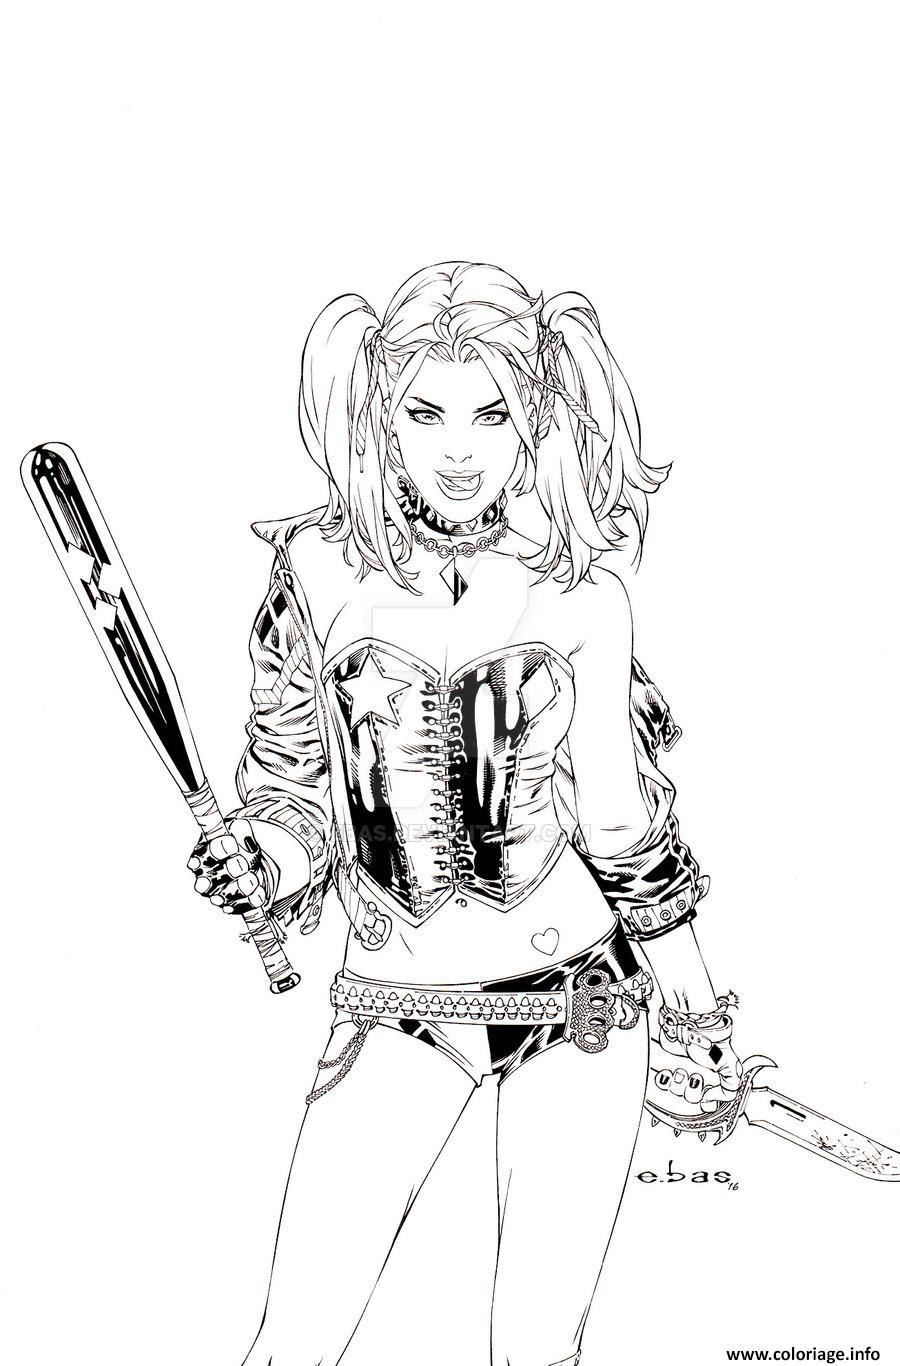 Coloriage Harley Quinn By Ebas Daaofp7 Jecoloriecom